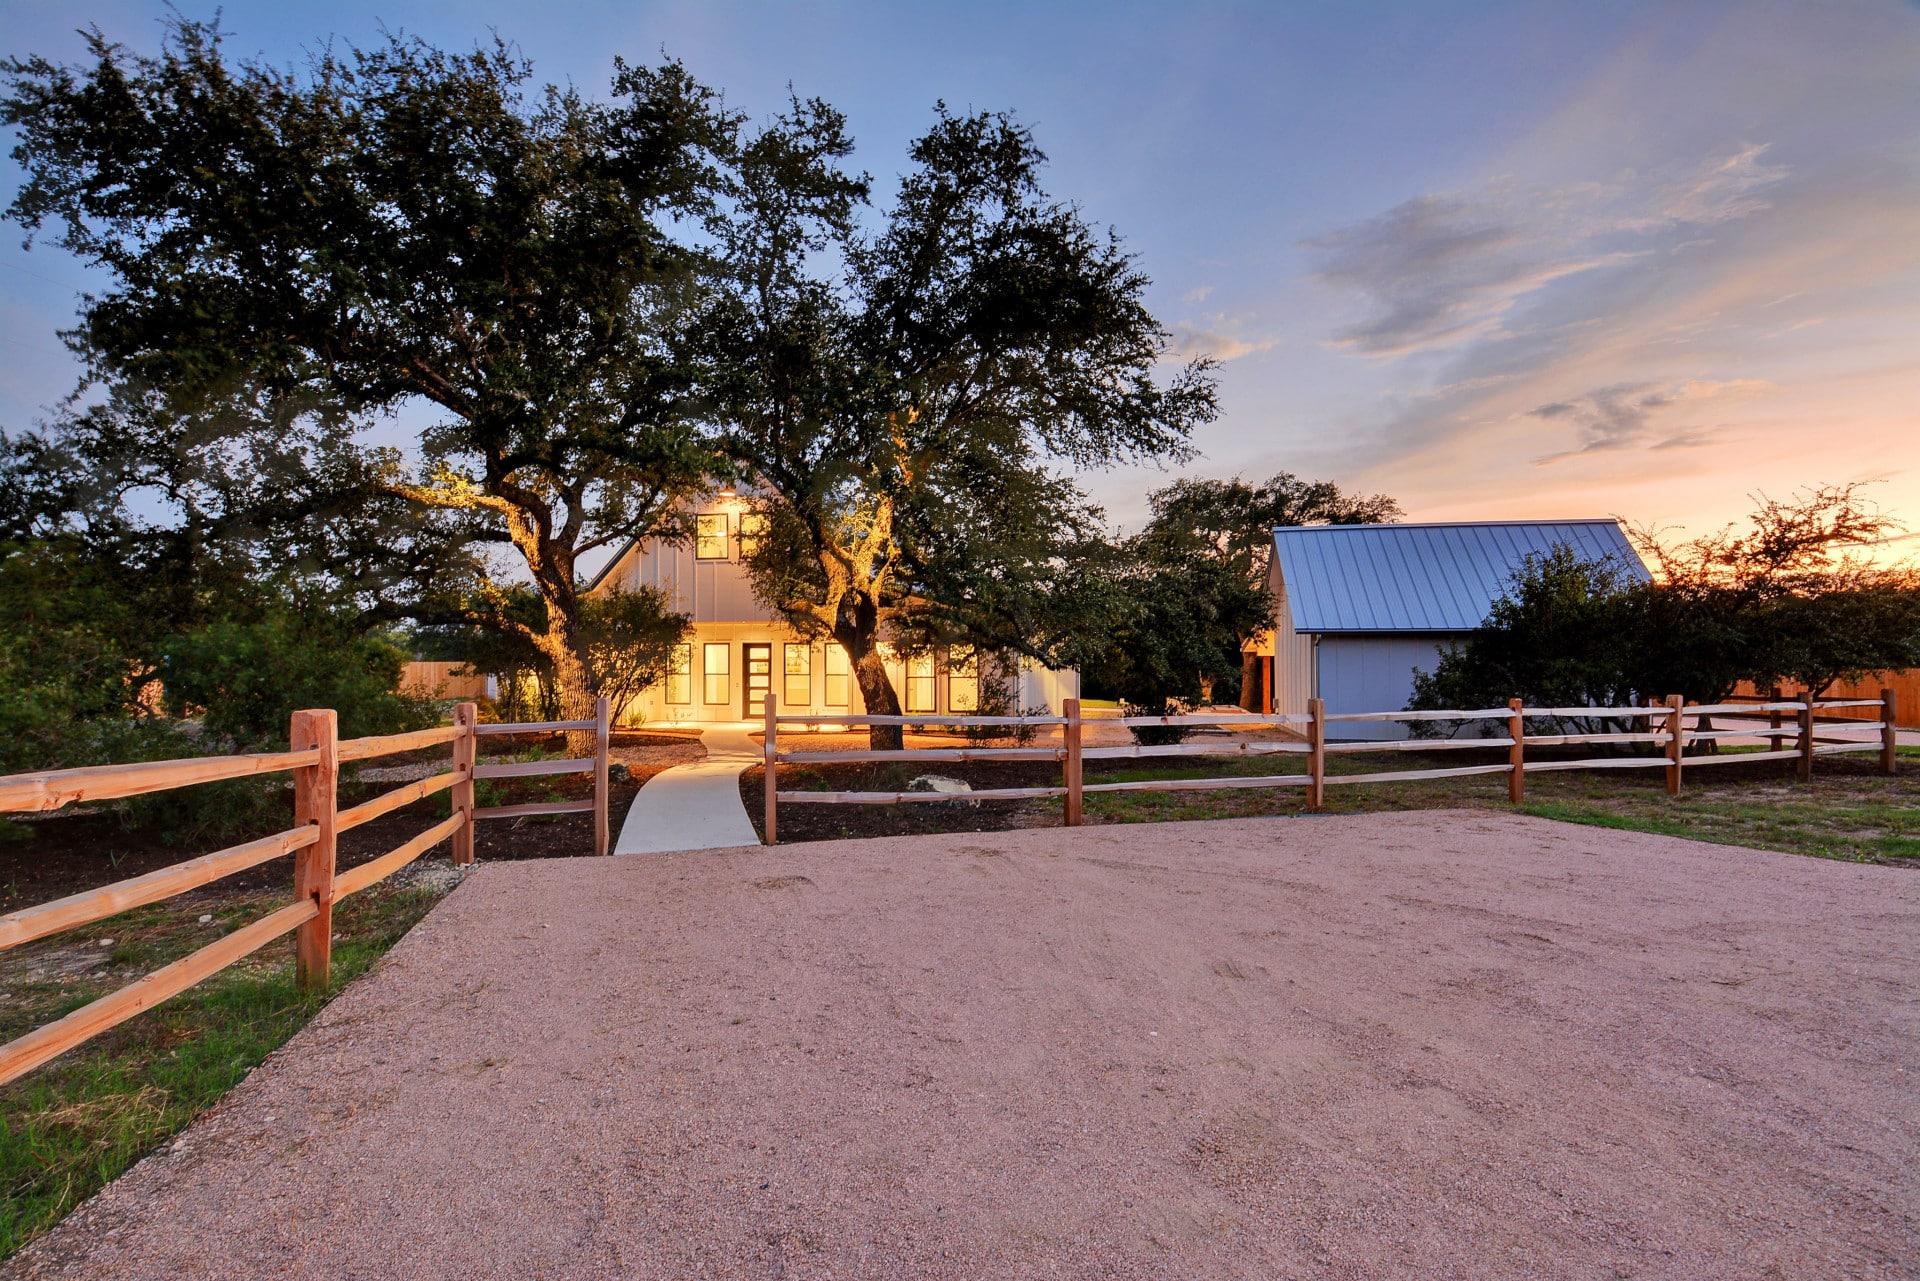 NATiVE Farmhouse